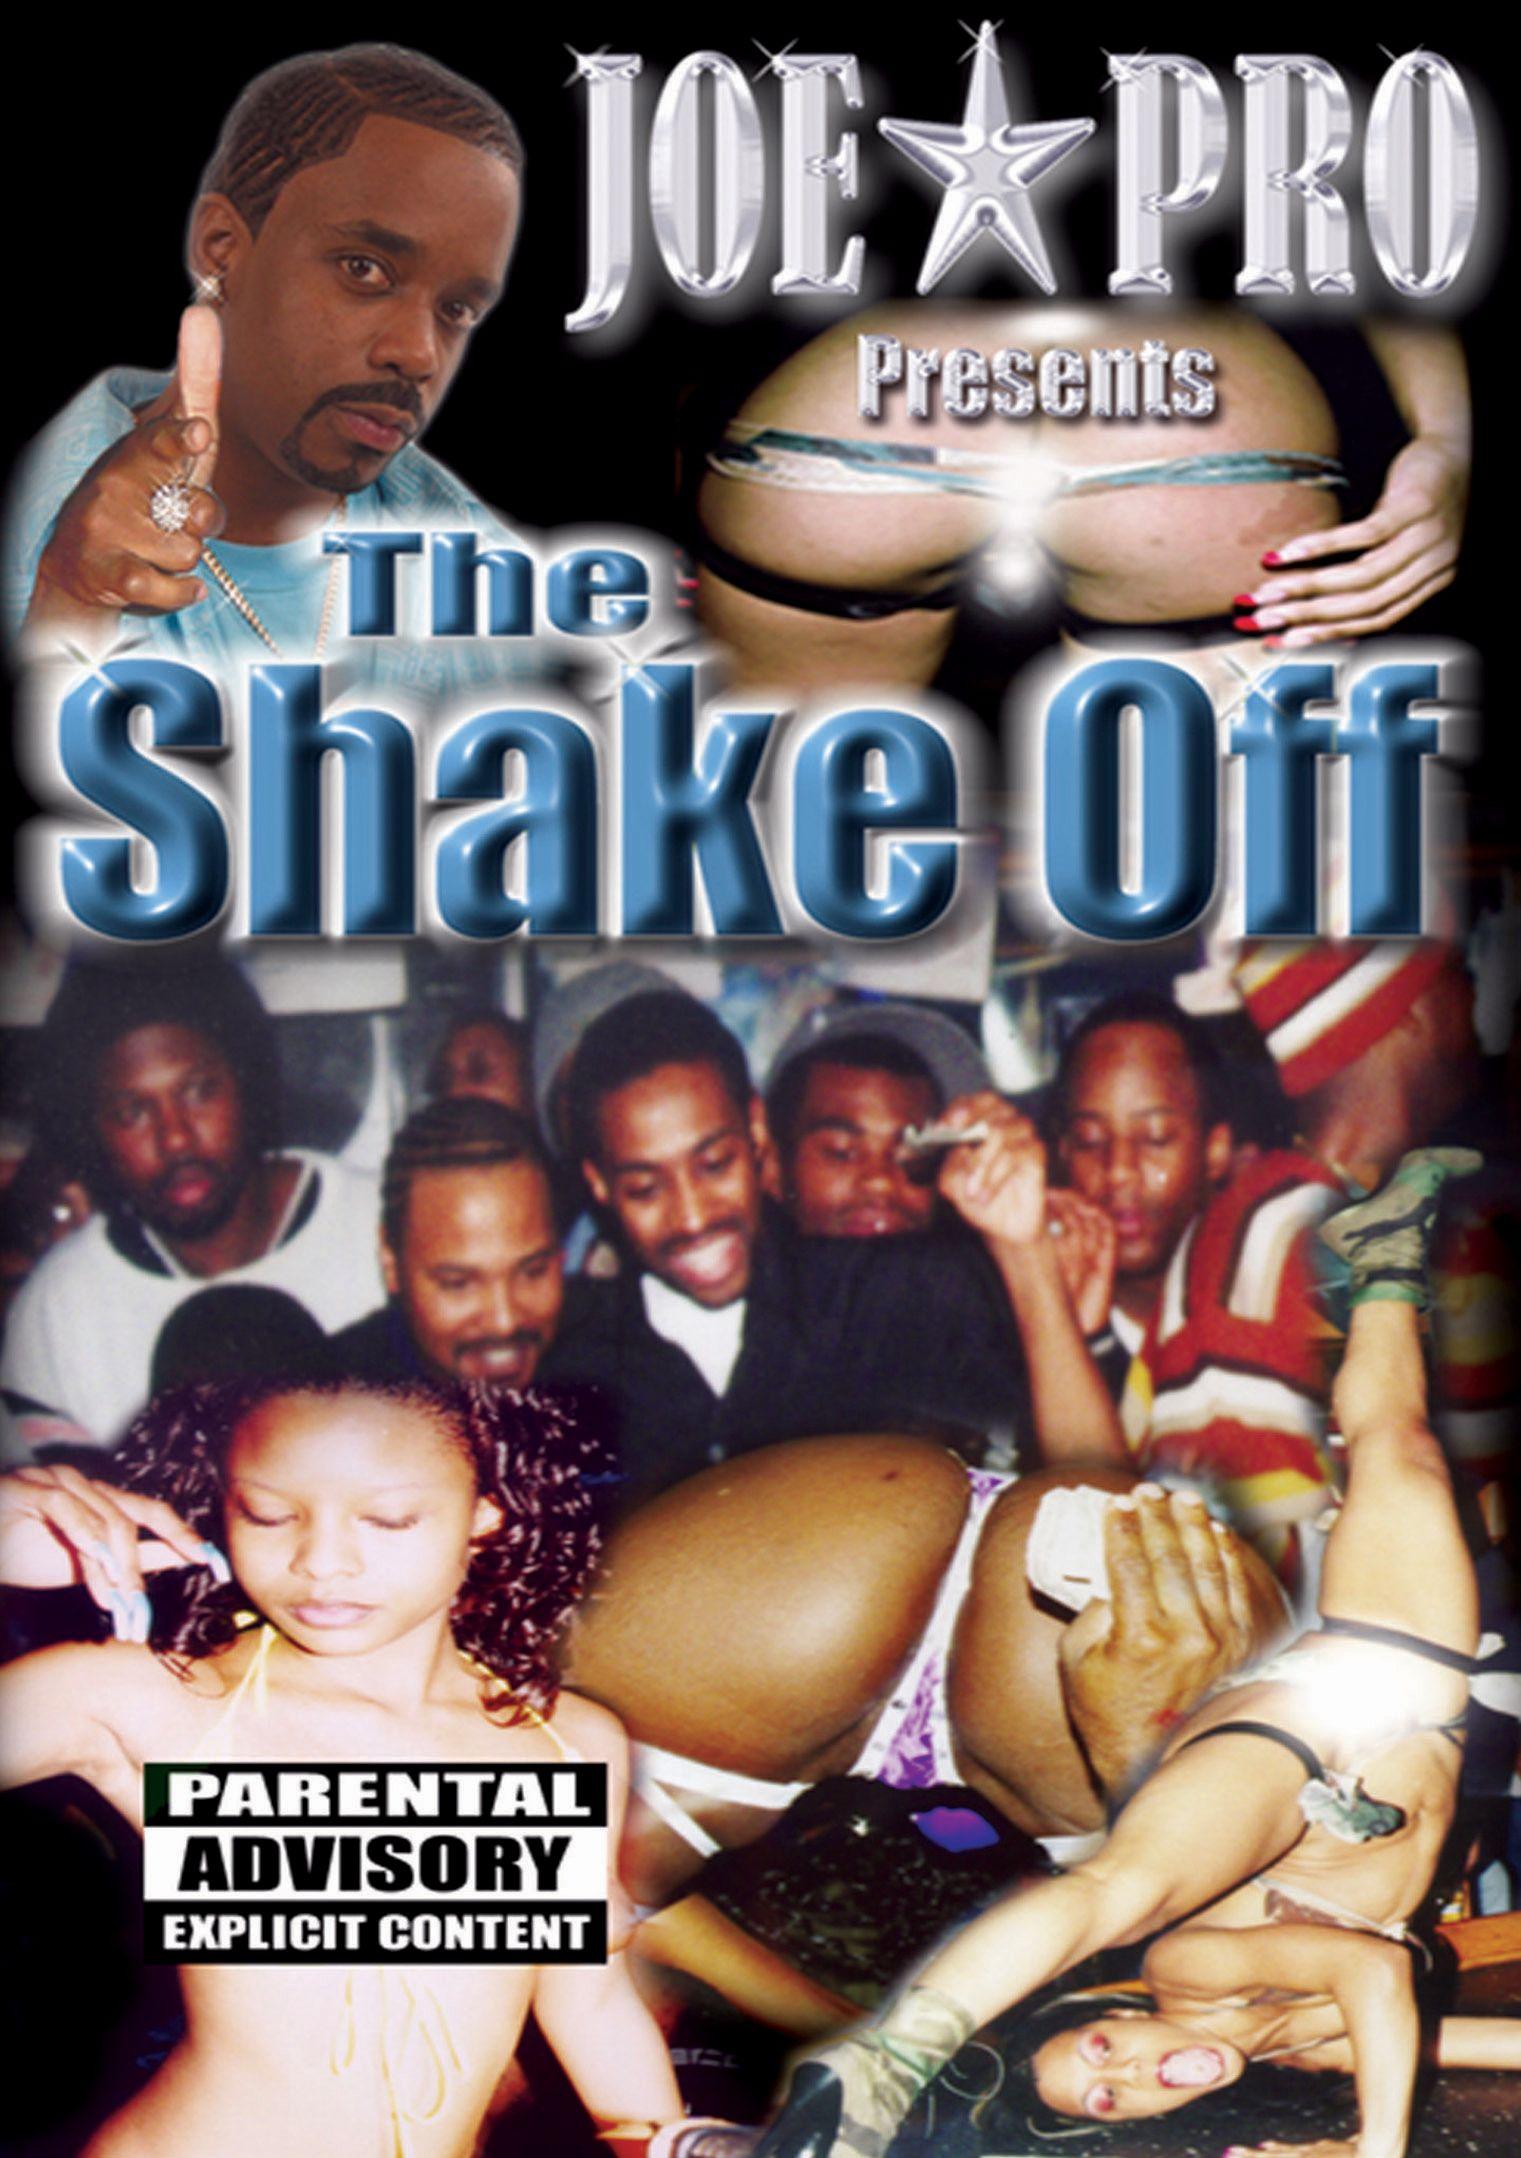 Joe Pro: The Shake Off